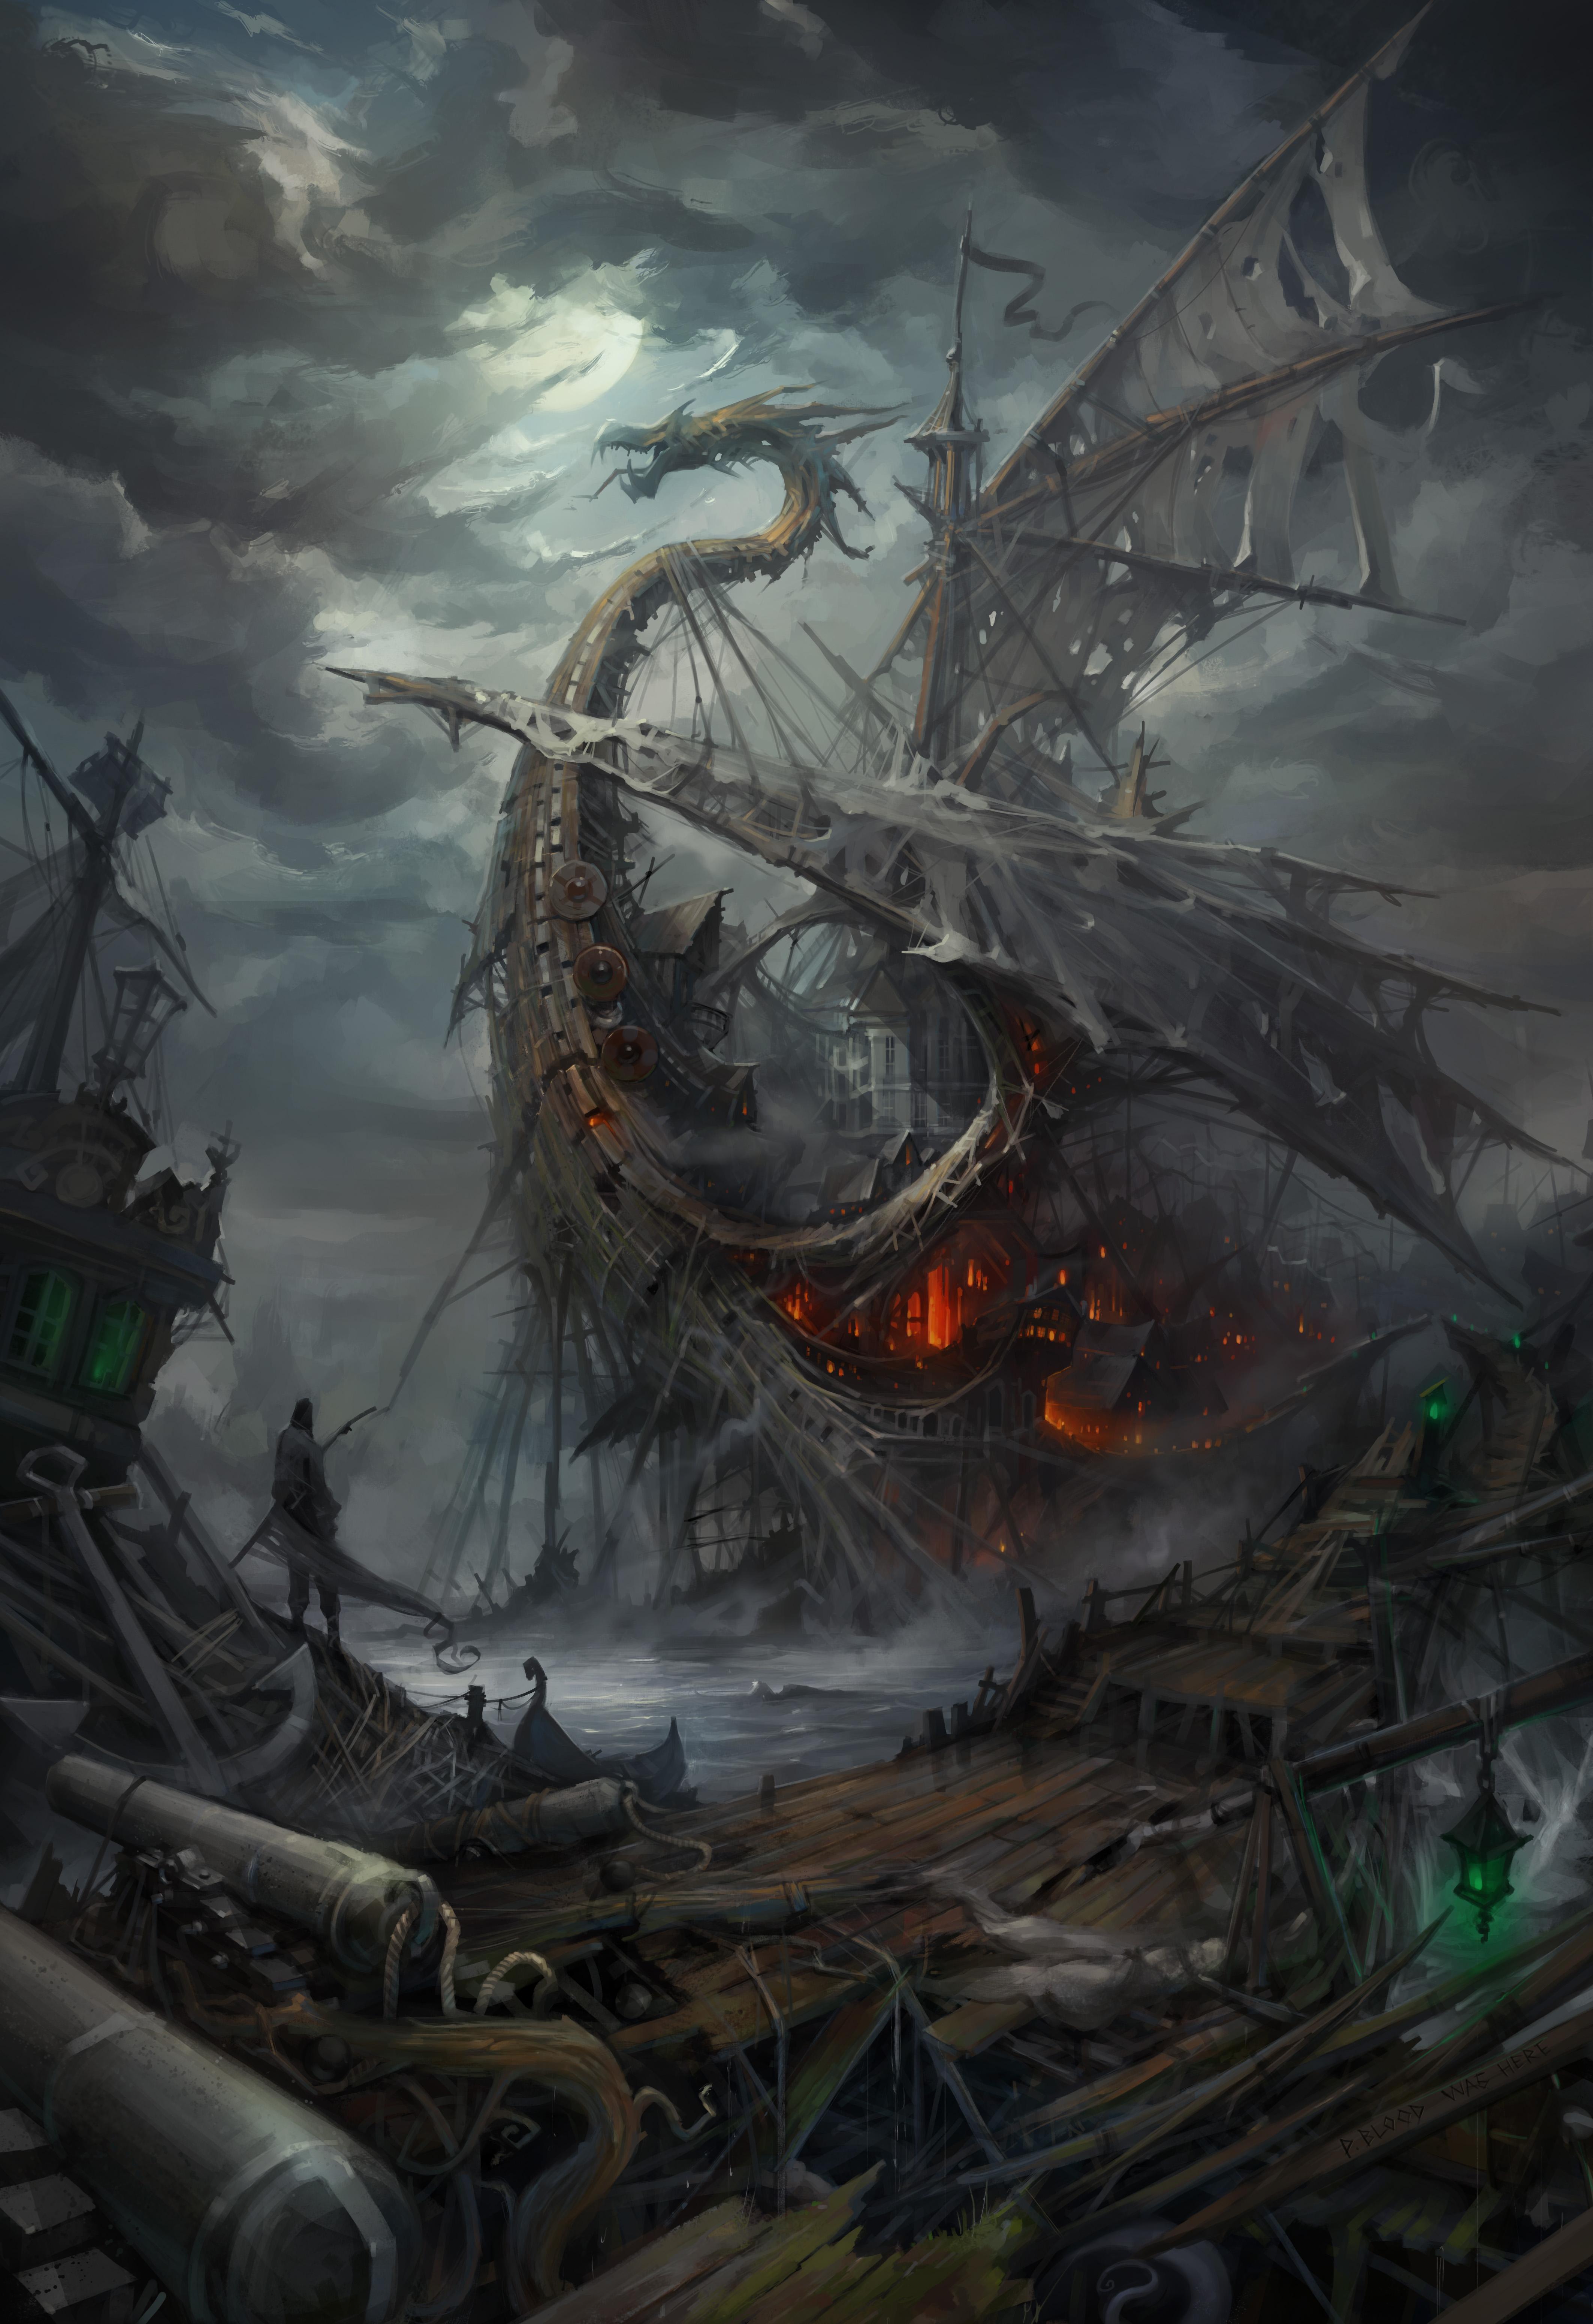 Lost ships by haryarti